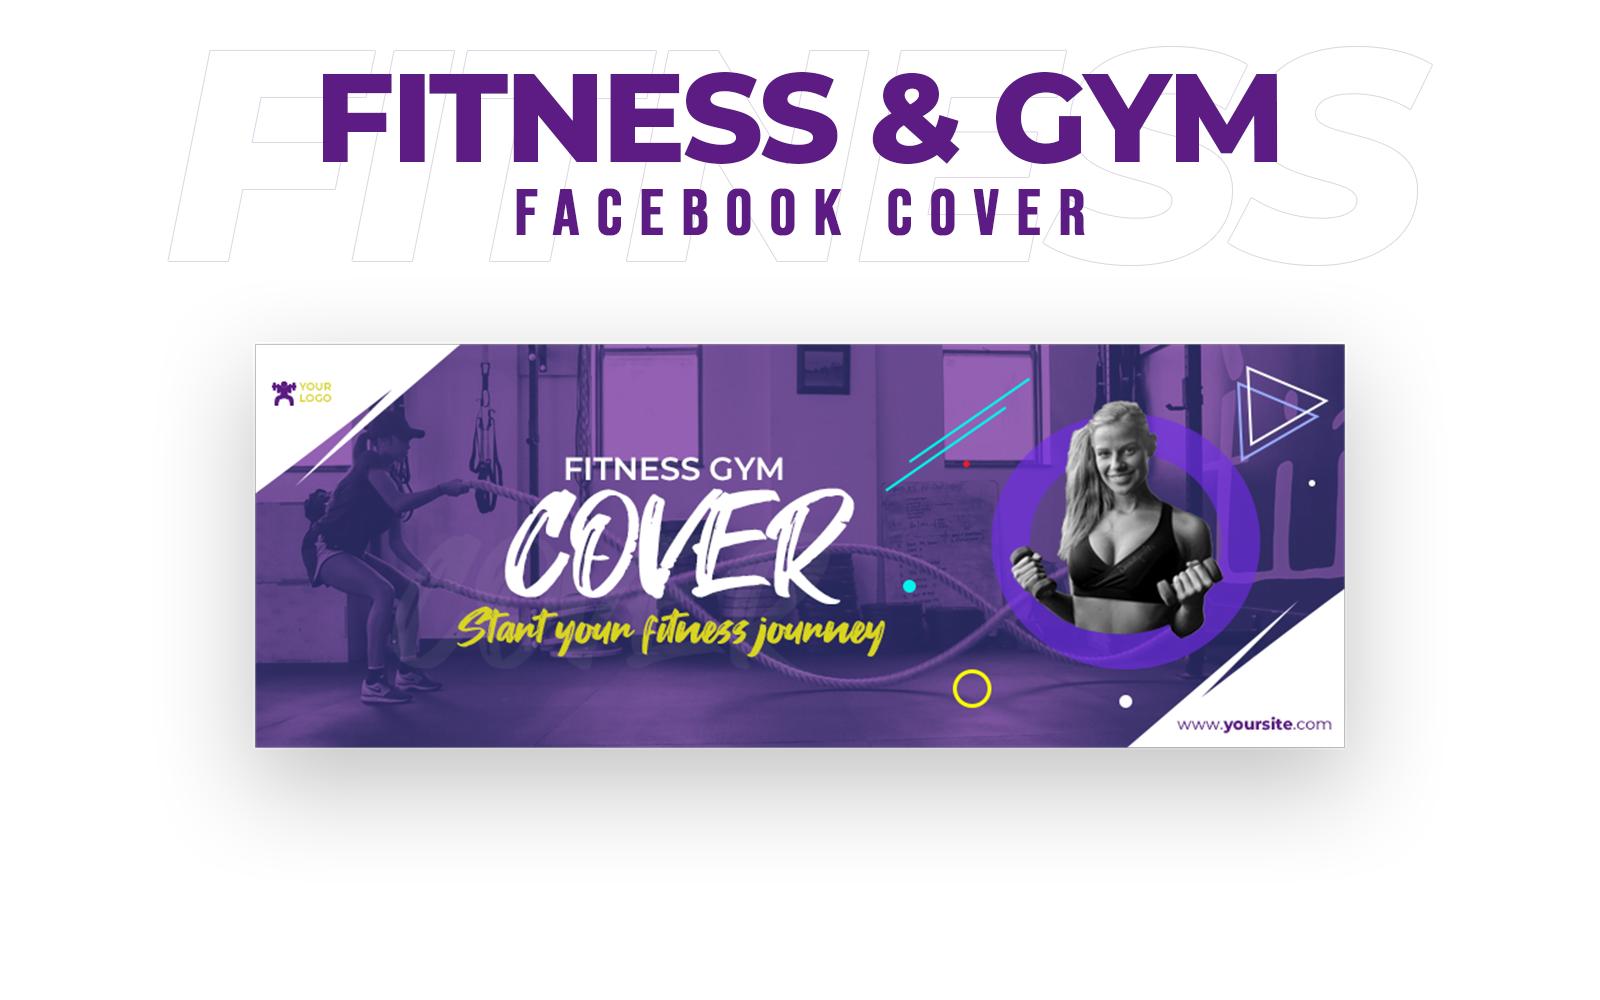 Fitness & Gym Facebook Cover Social Media